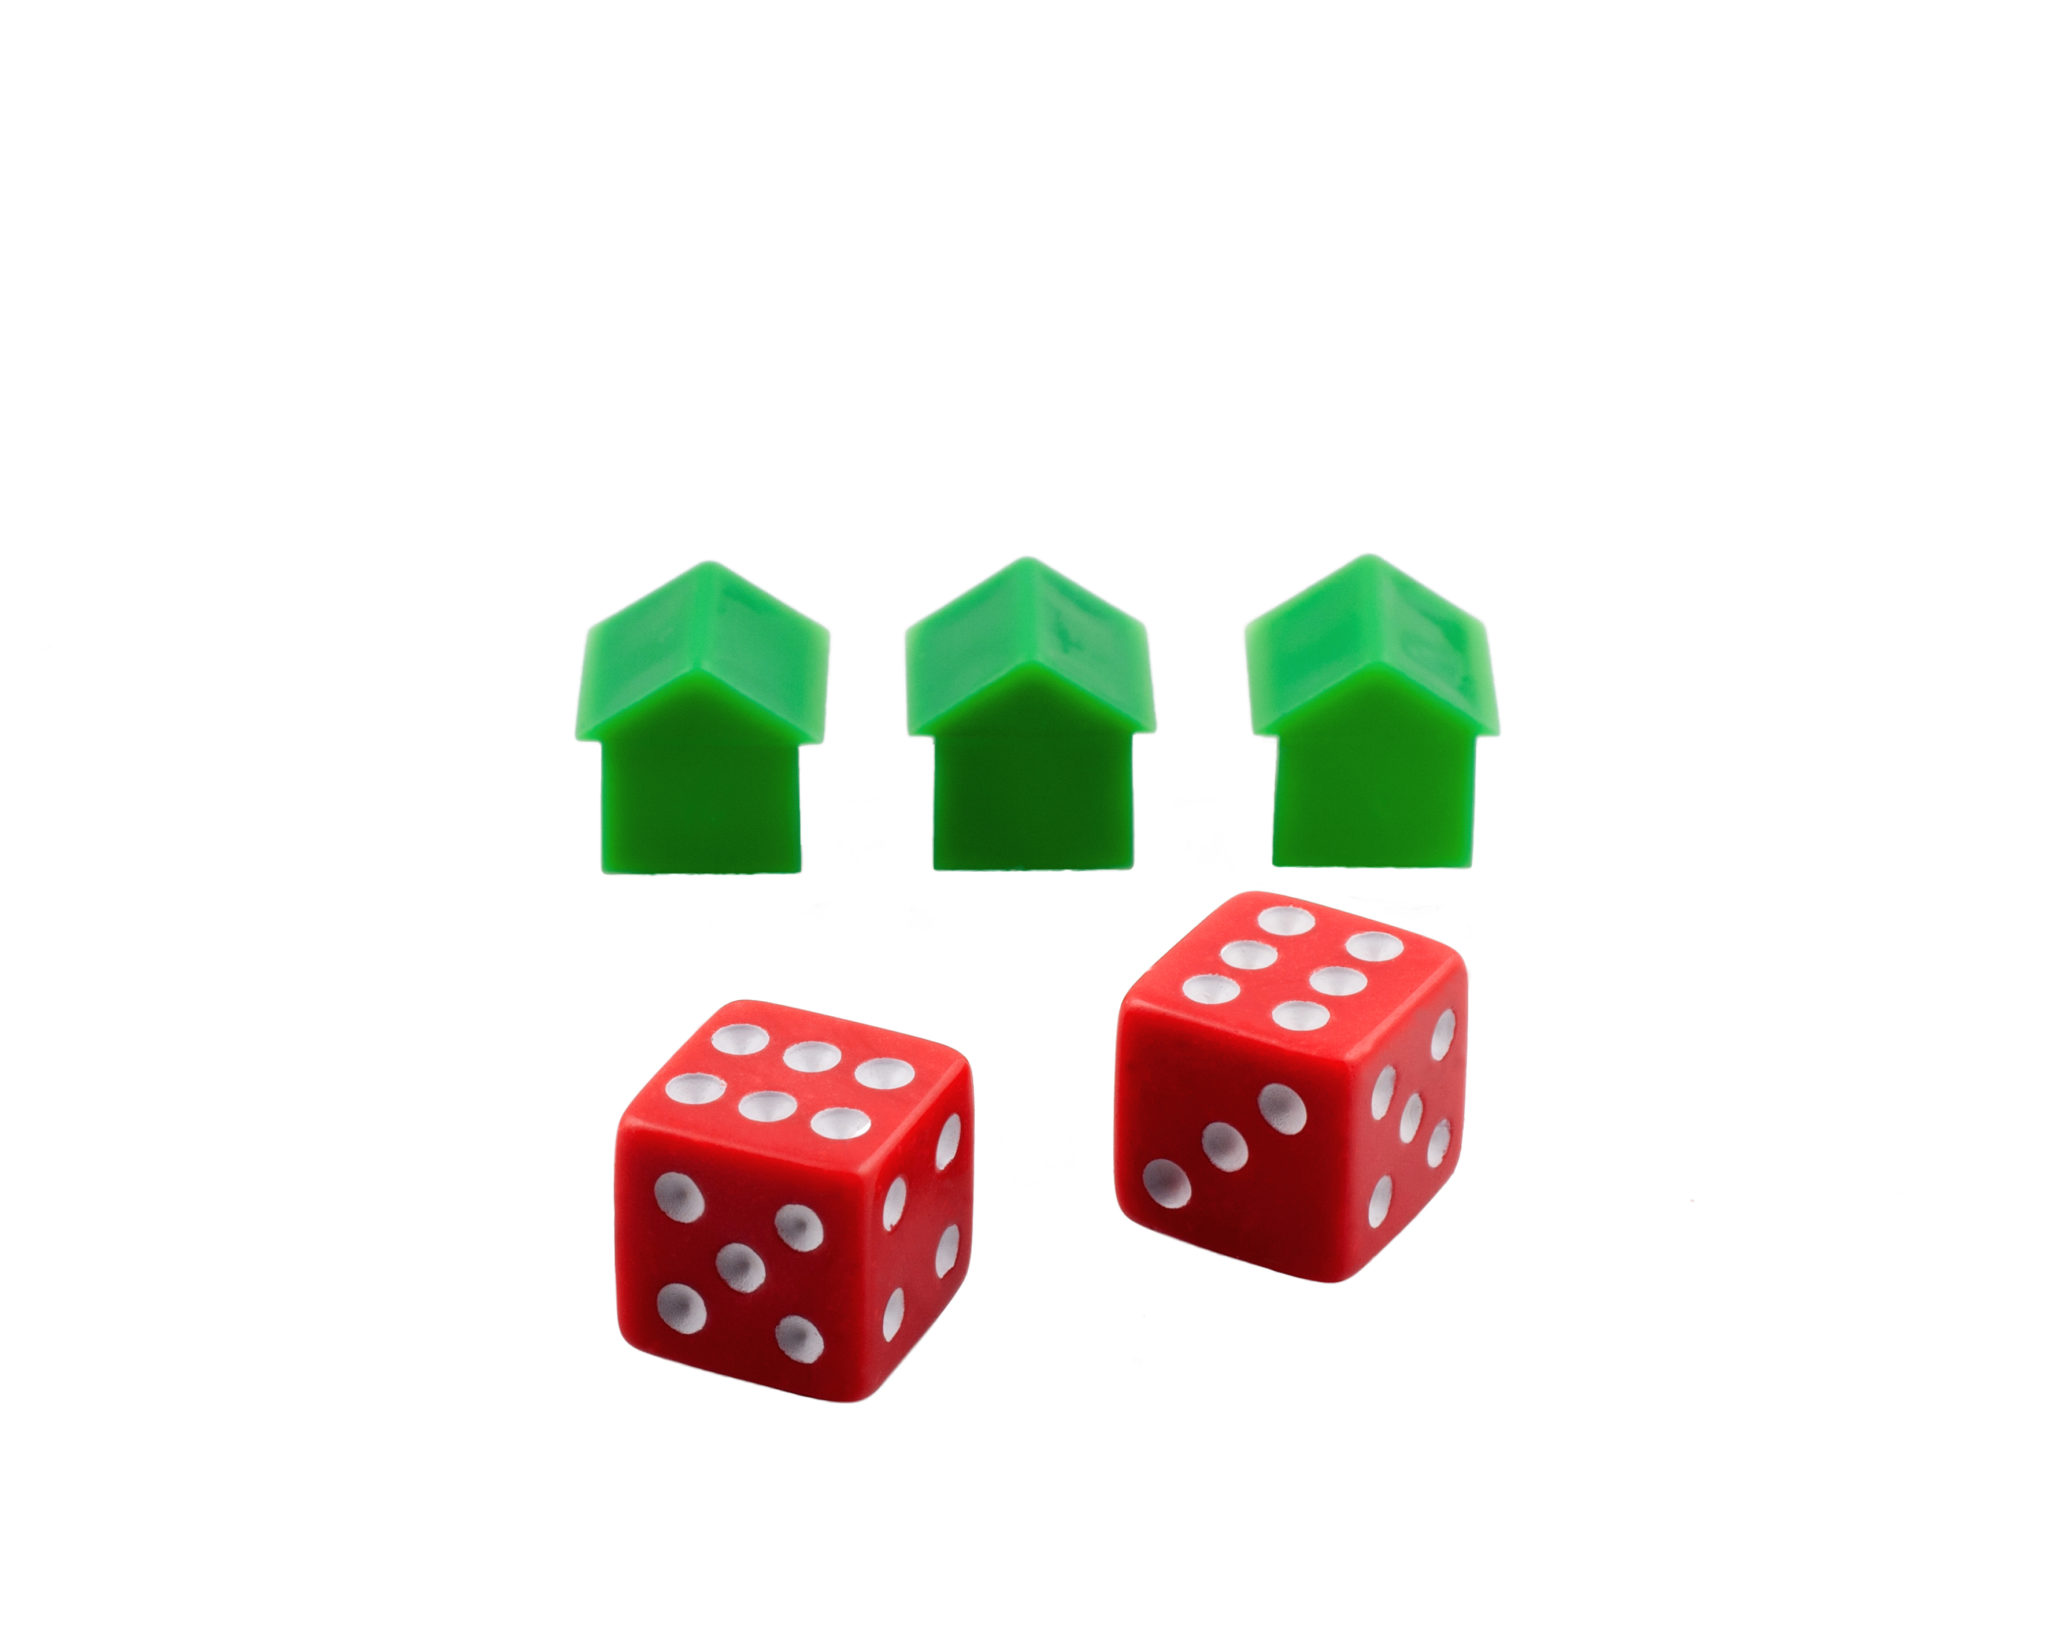 Zillow, Trulia, realtor.com now capturing 1 in 3 desktop visits in real estate category